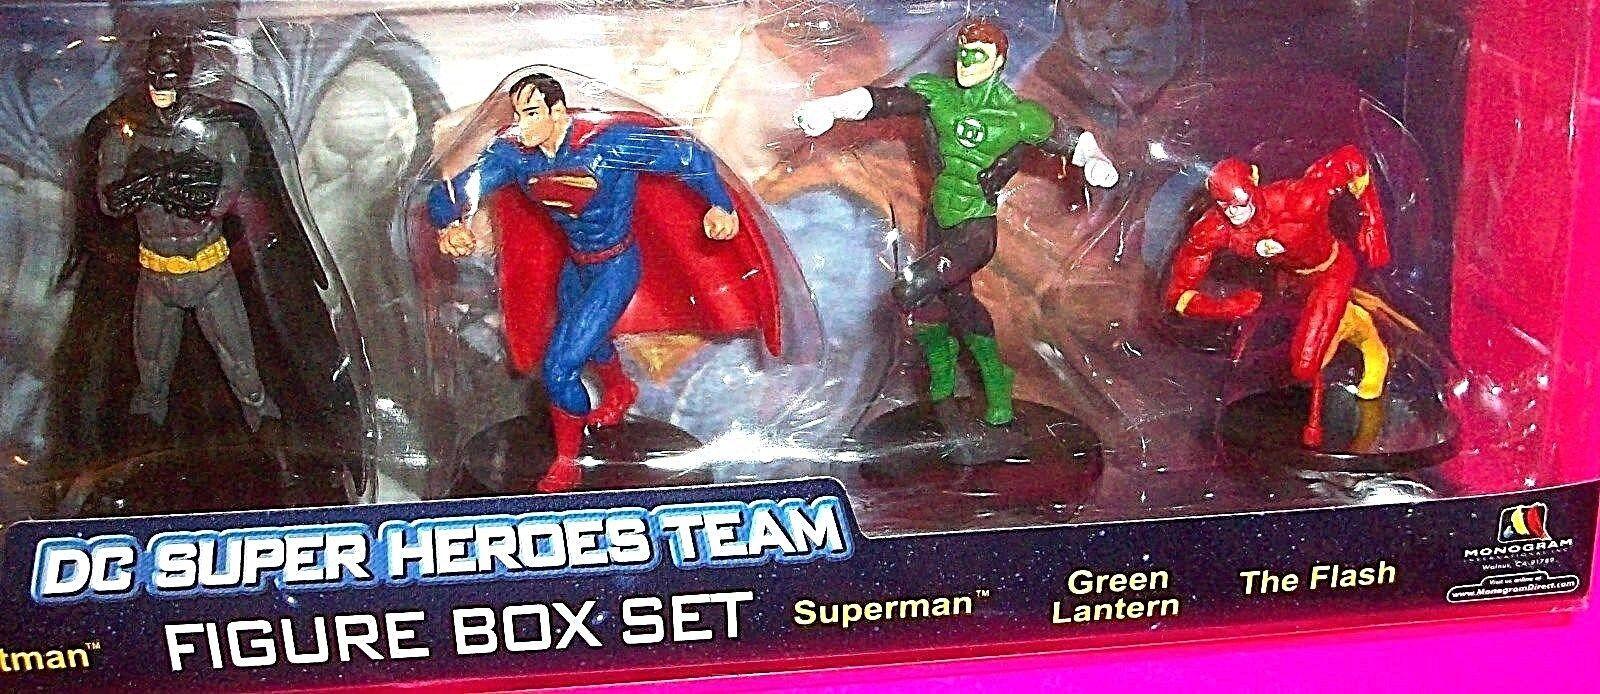 DC Super Heroes Team ACTION FIGURE Set Set Set Batman Superman Wonder Woman Joker Flash d31228